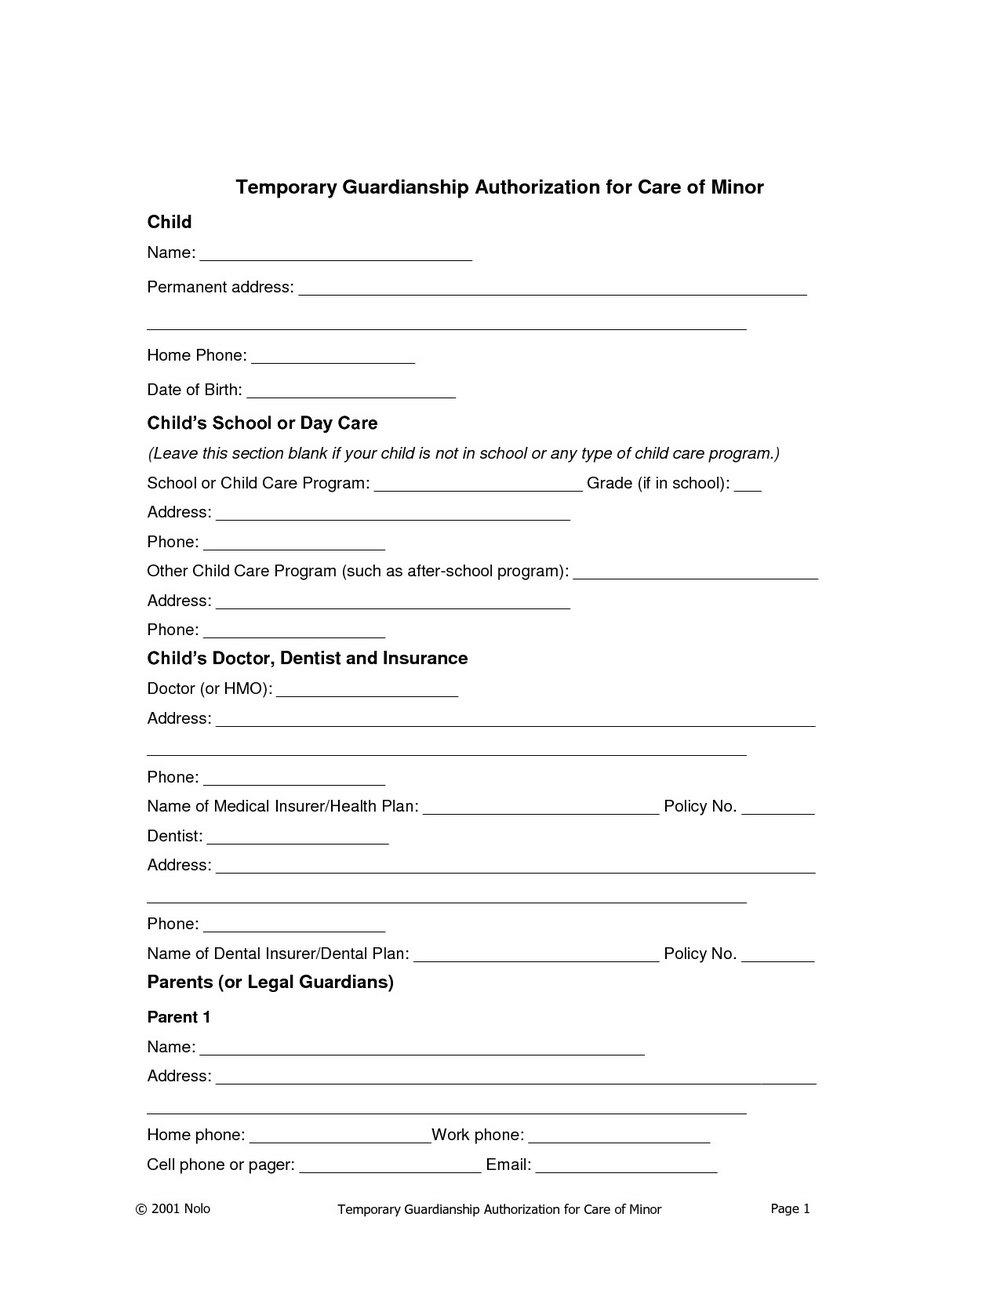 Temporary Legal Guardianship Form California